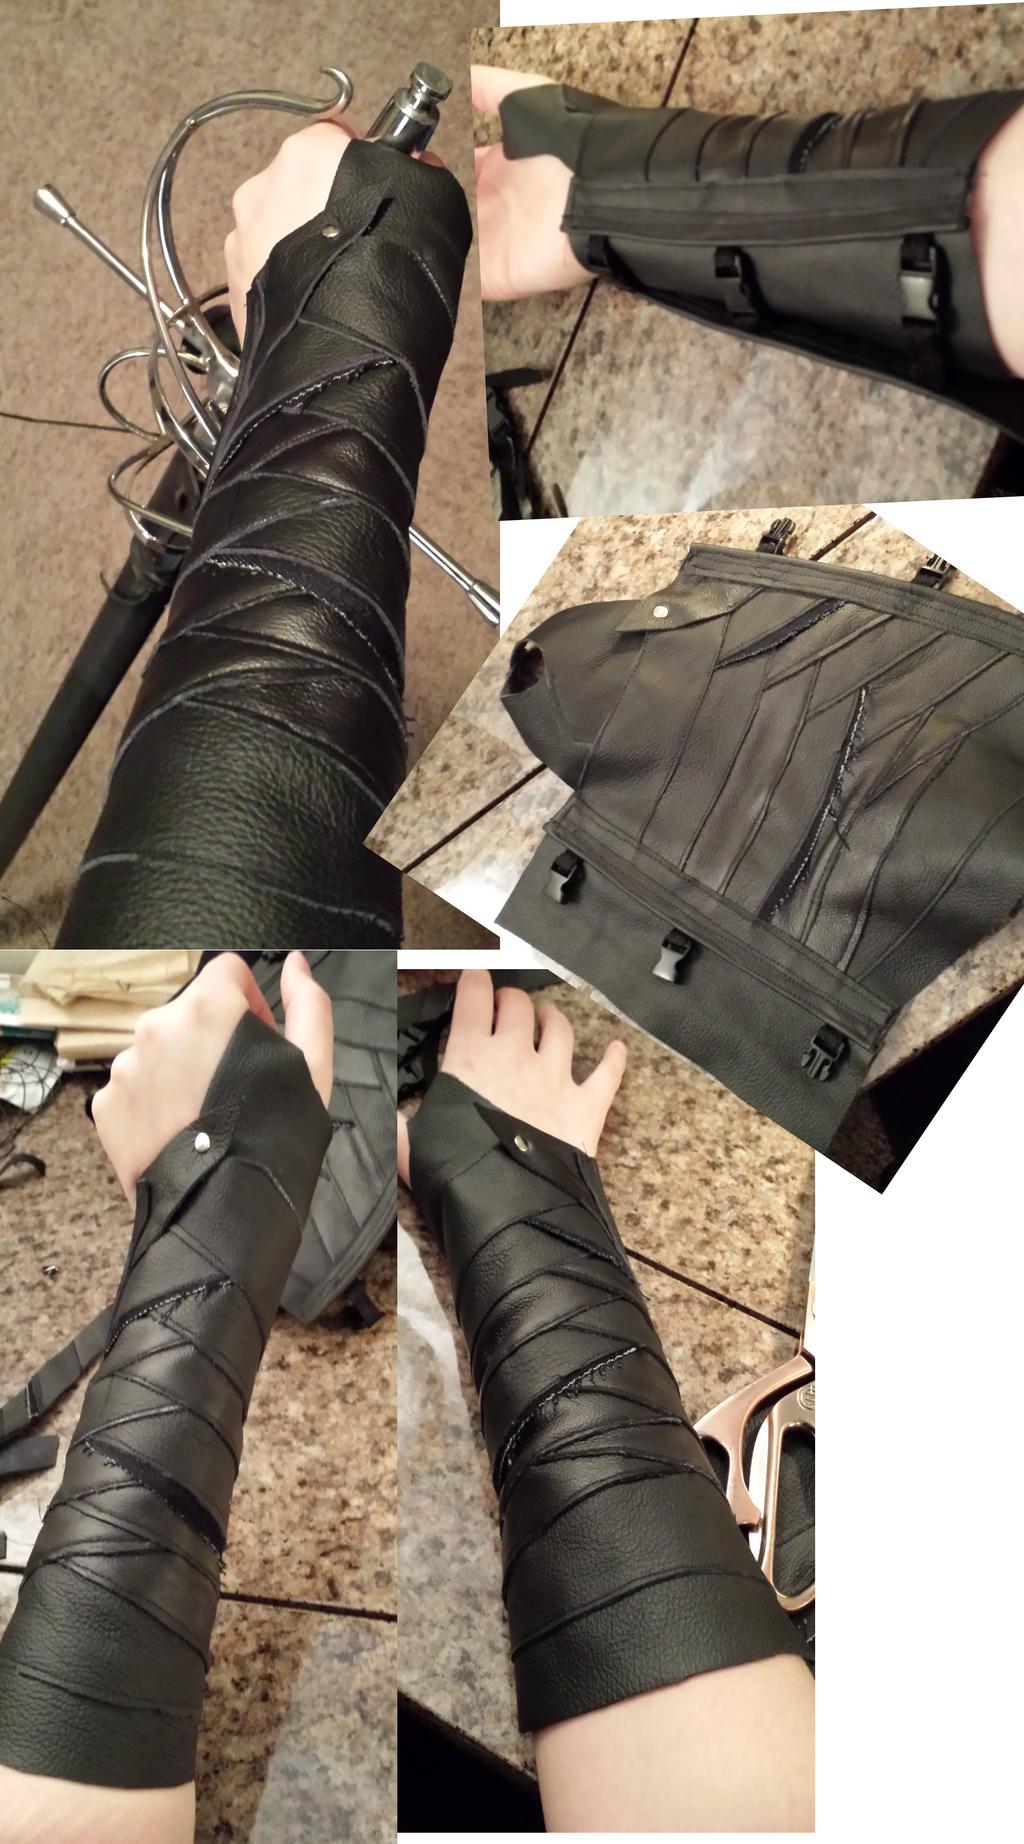 Leather bracers 3.0: Gamora by CaptainMorganTeague